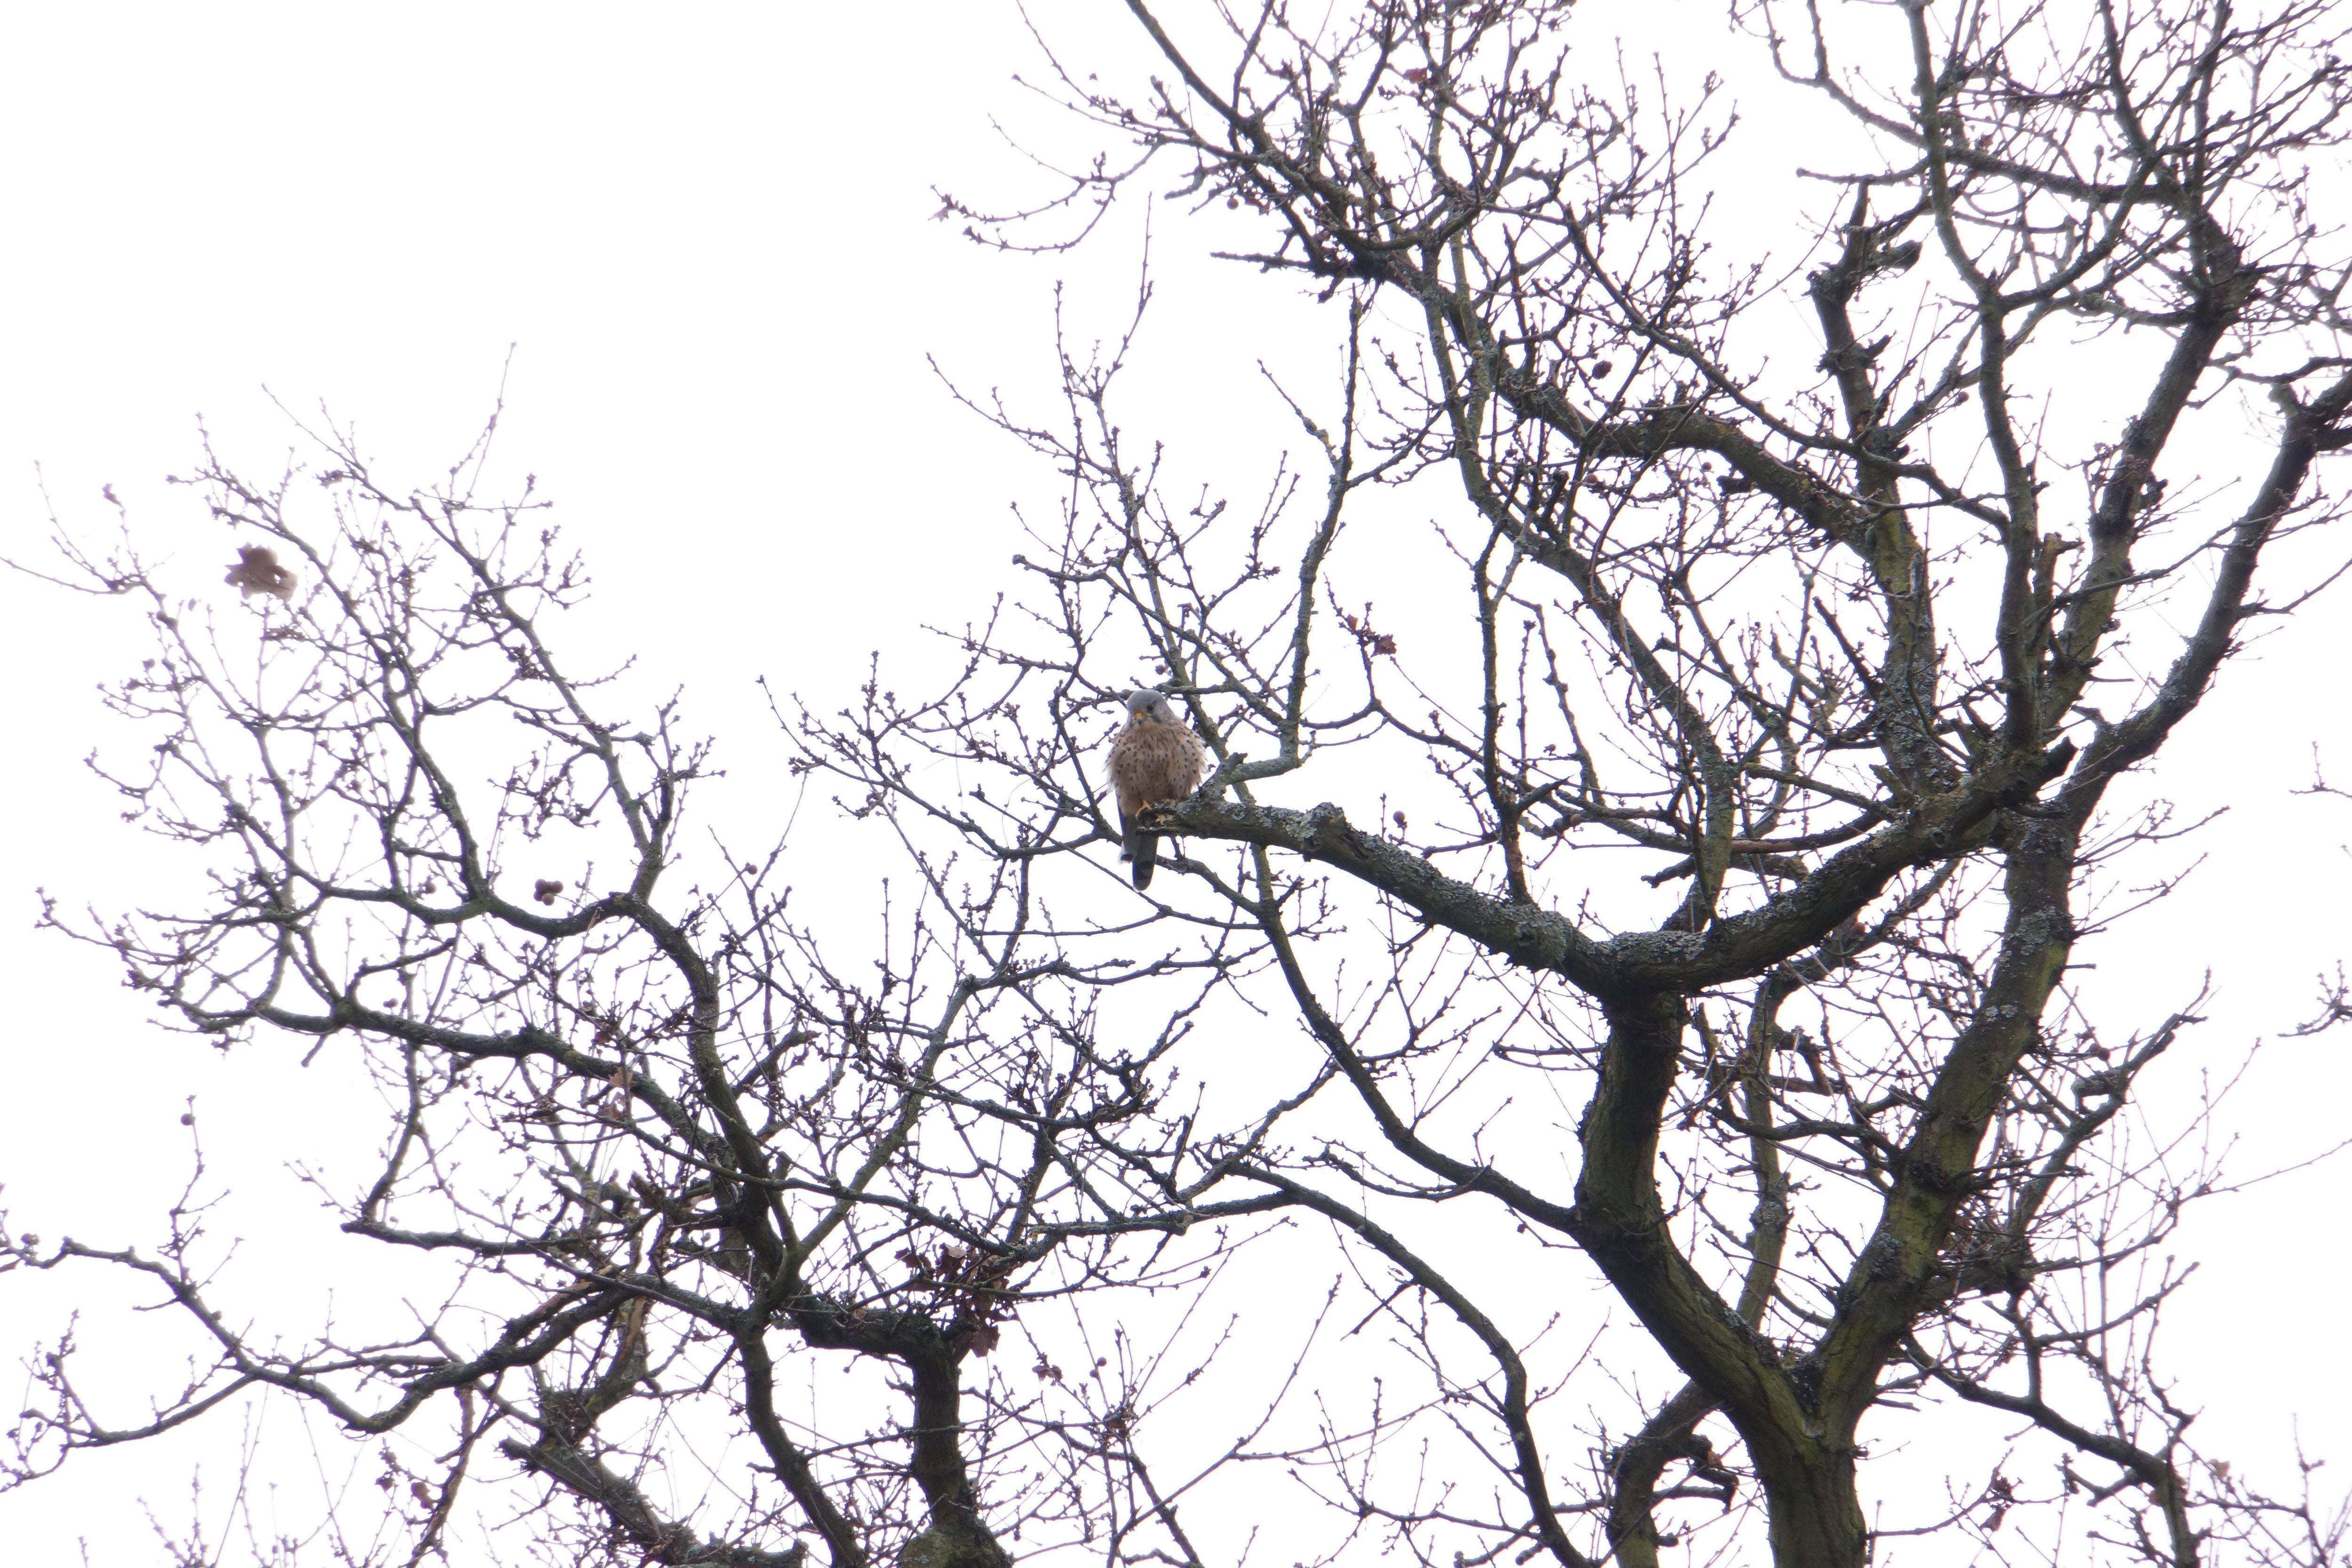 RSPB Big Garden Bird Watch at Kingston Uni - Roehampton Vale